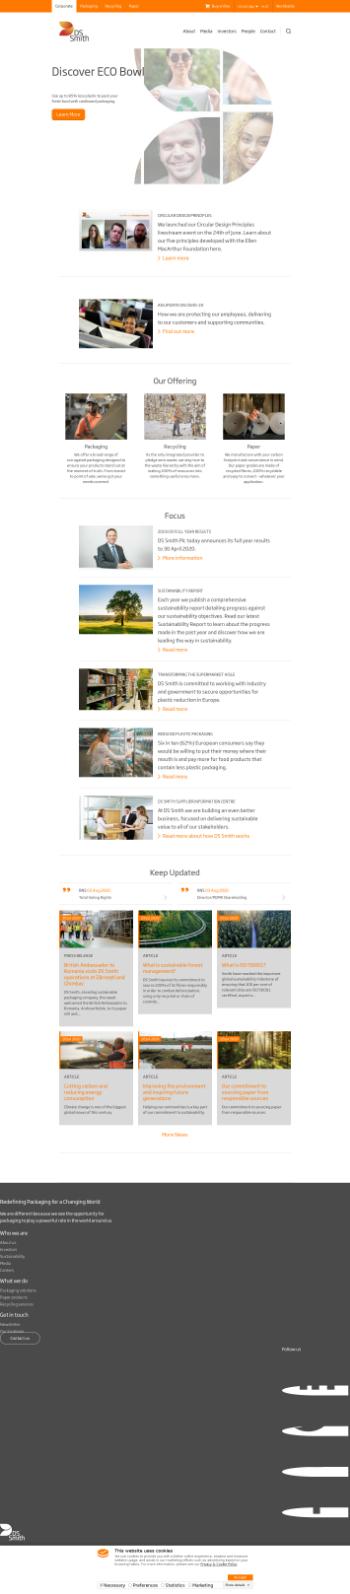 DS Smith Plc Website Screenshot